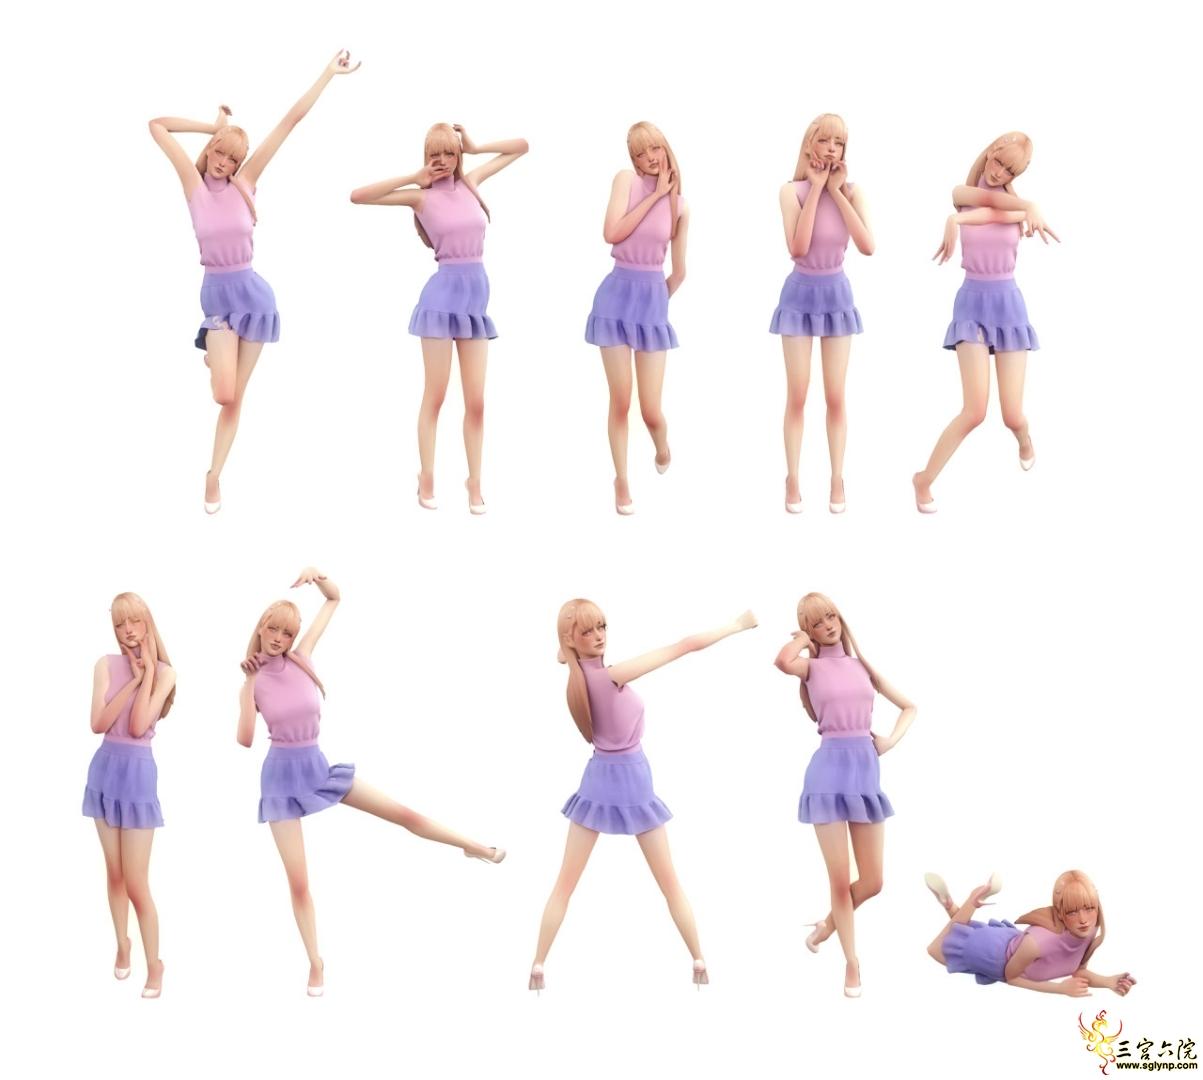 hhhh动态图_【外搬动作】作者:Maylily,适合拍照的女生、男生、双人动作 ...